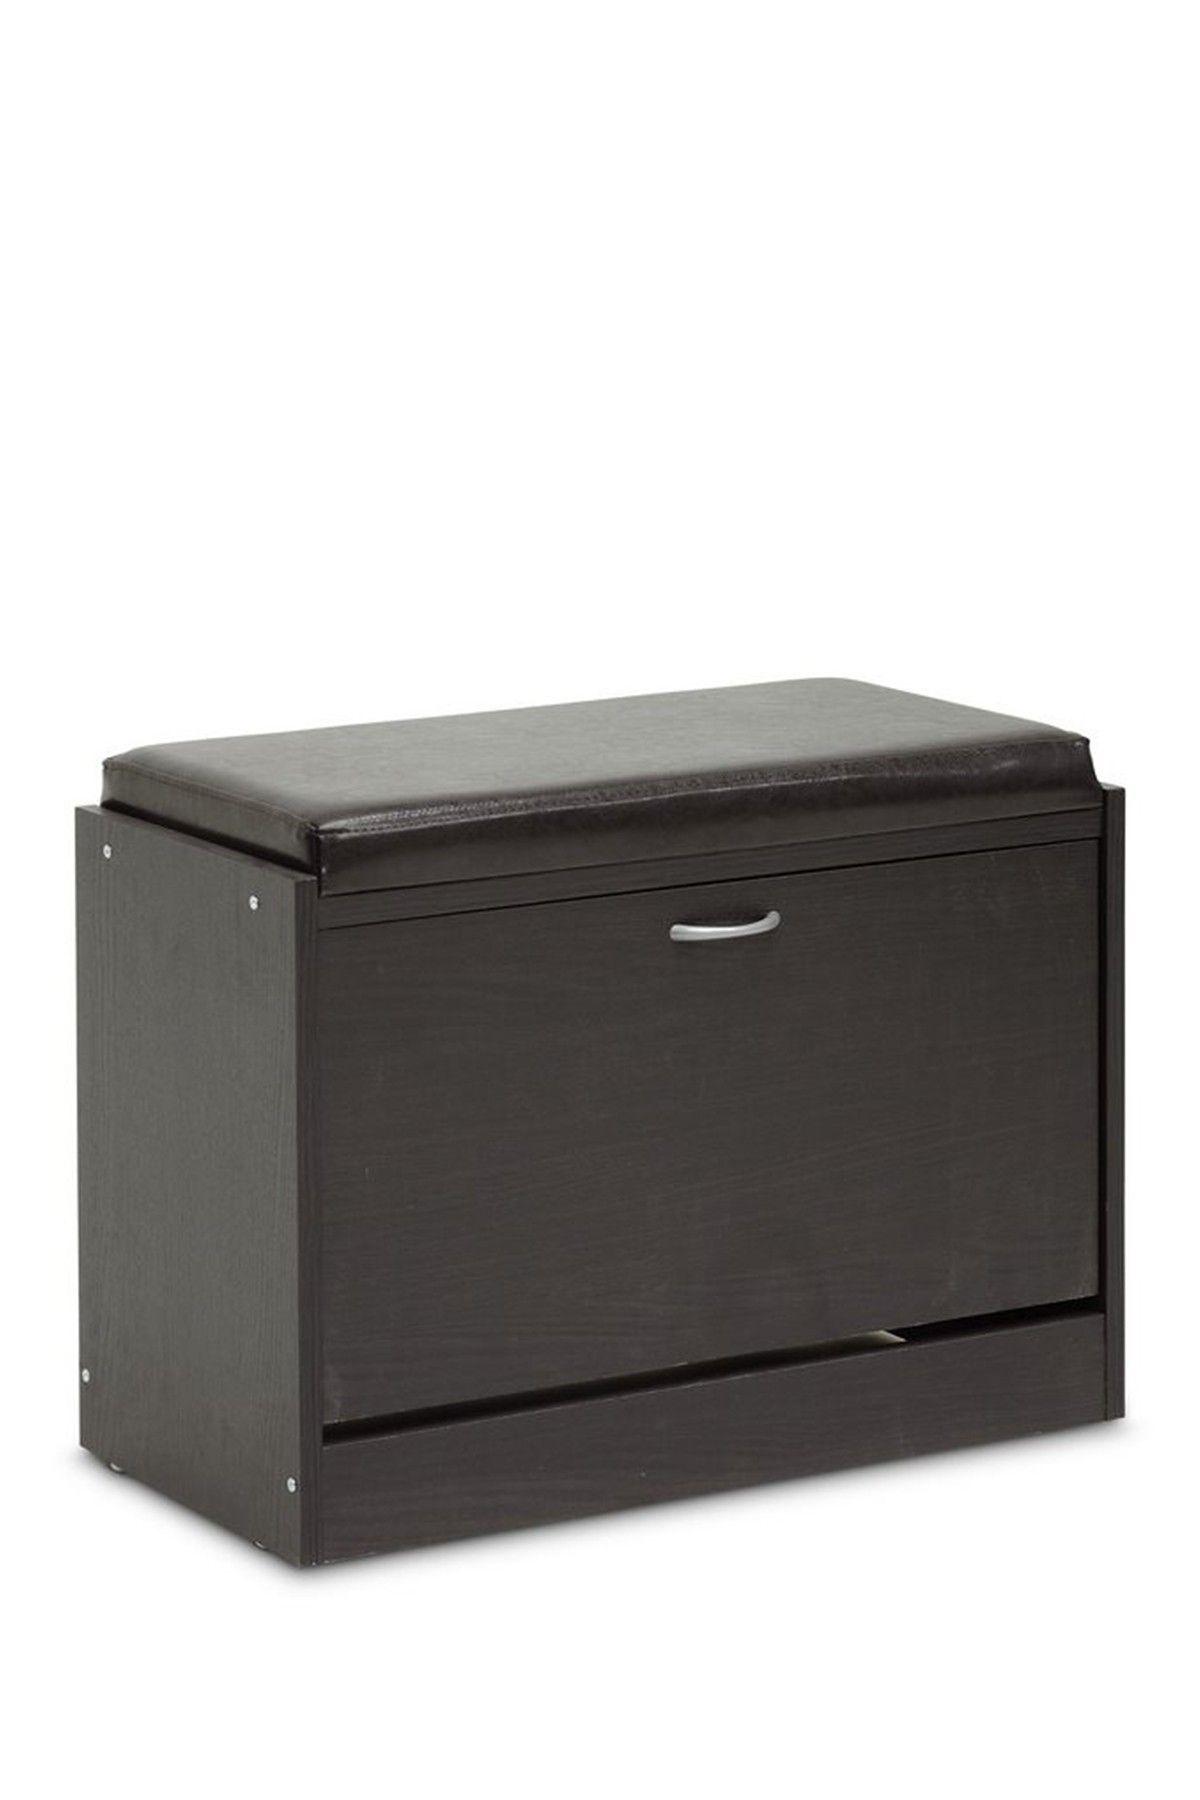 Bainbridge Dark Brown Shoe Rack With Seating Cushion By Wholesale